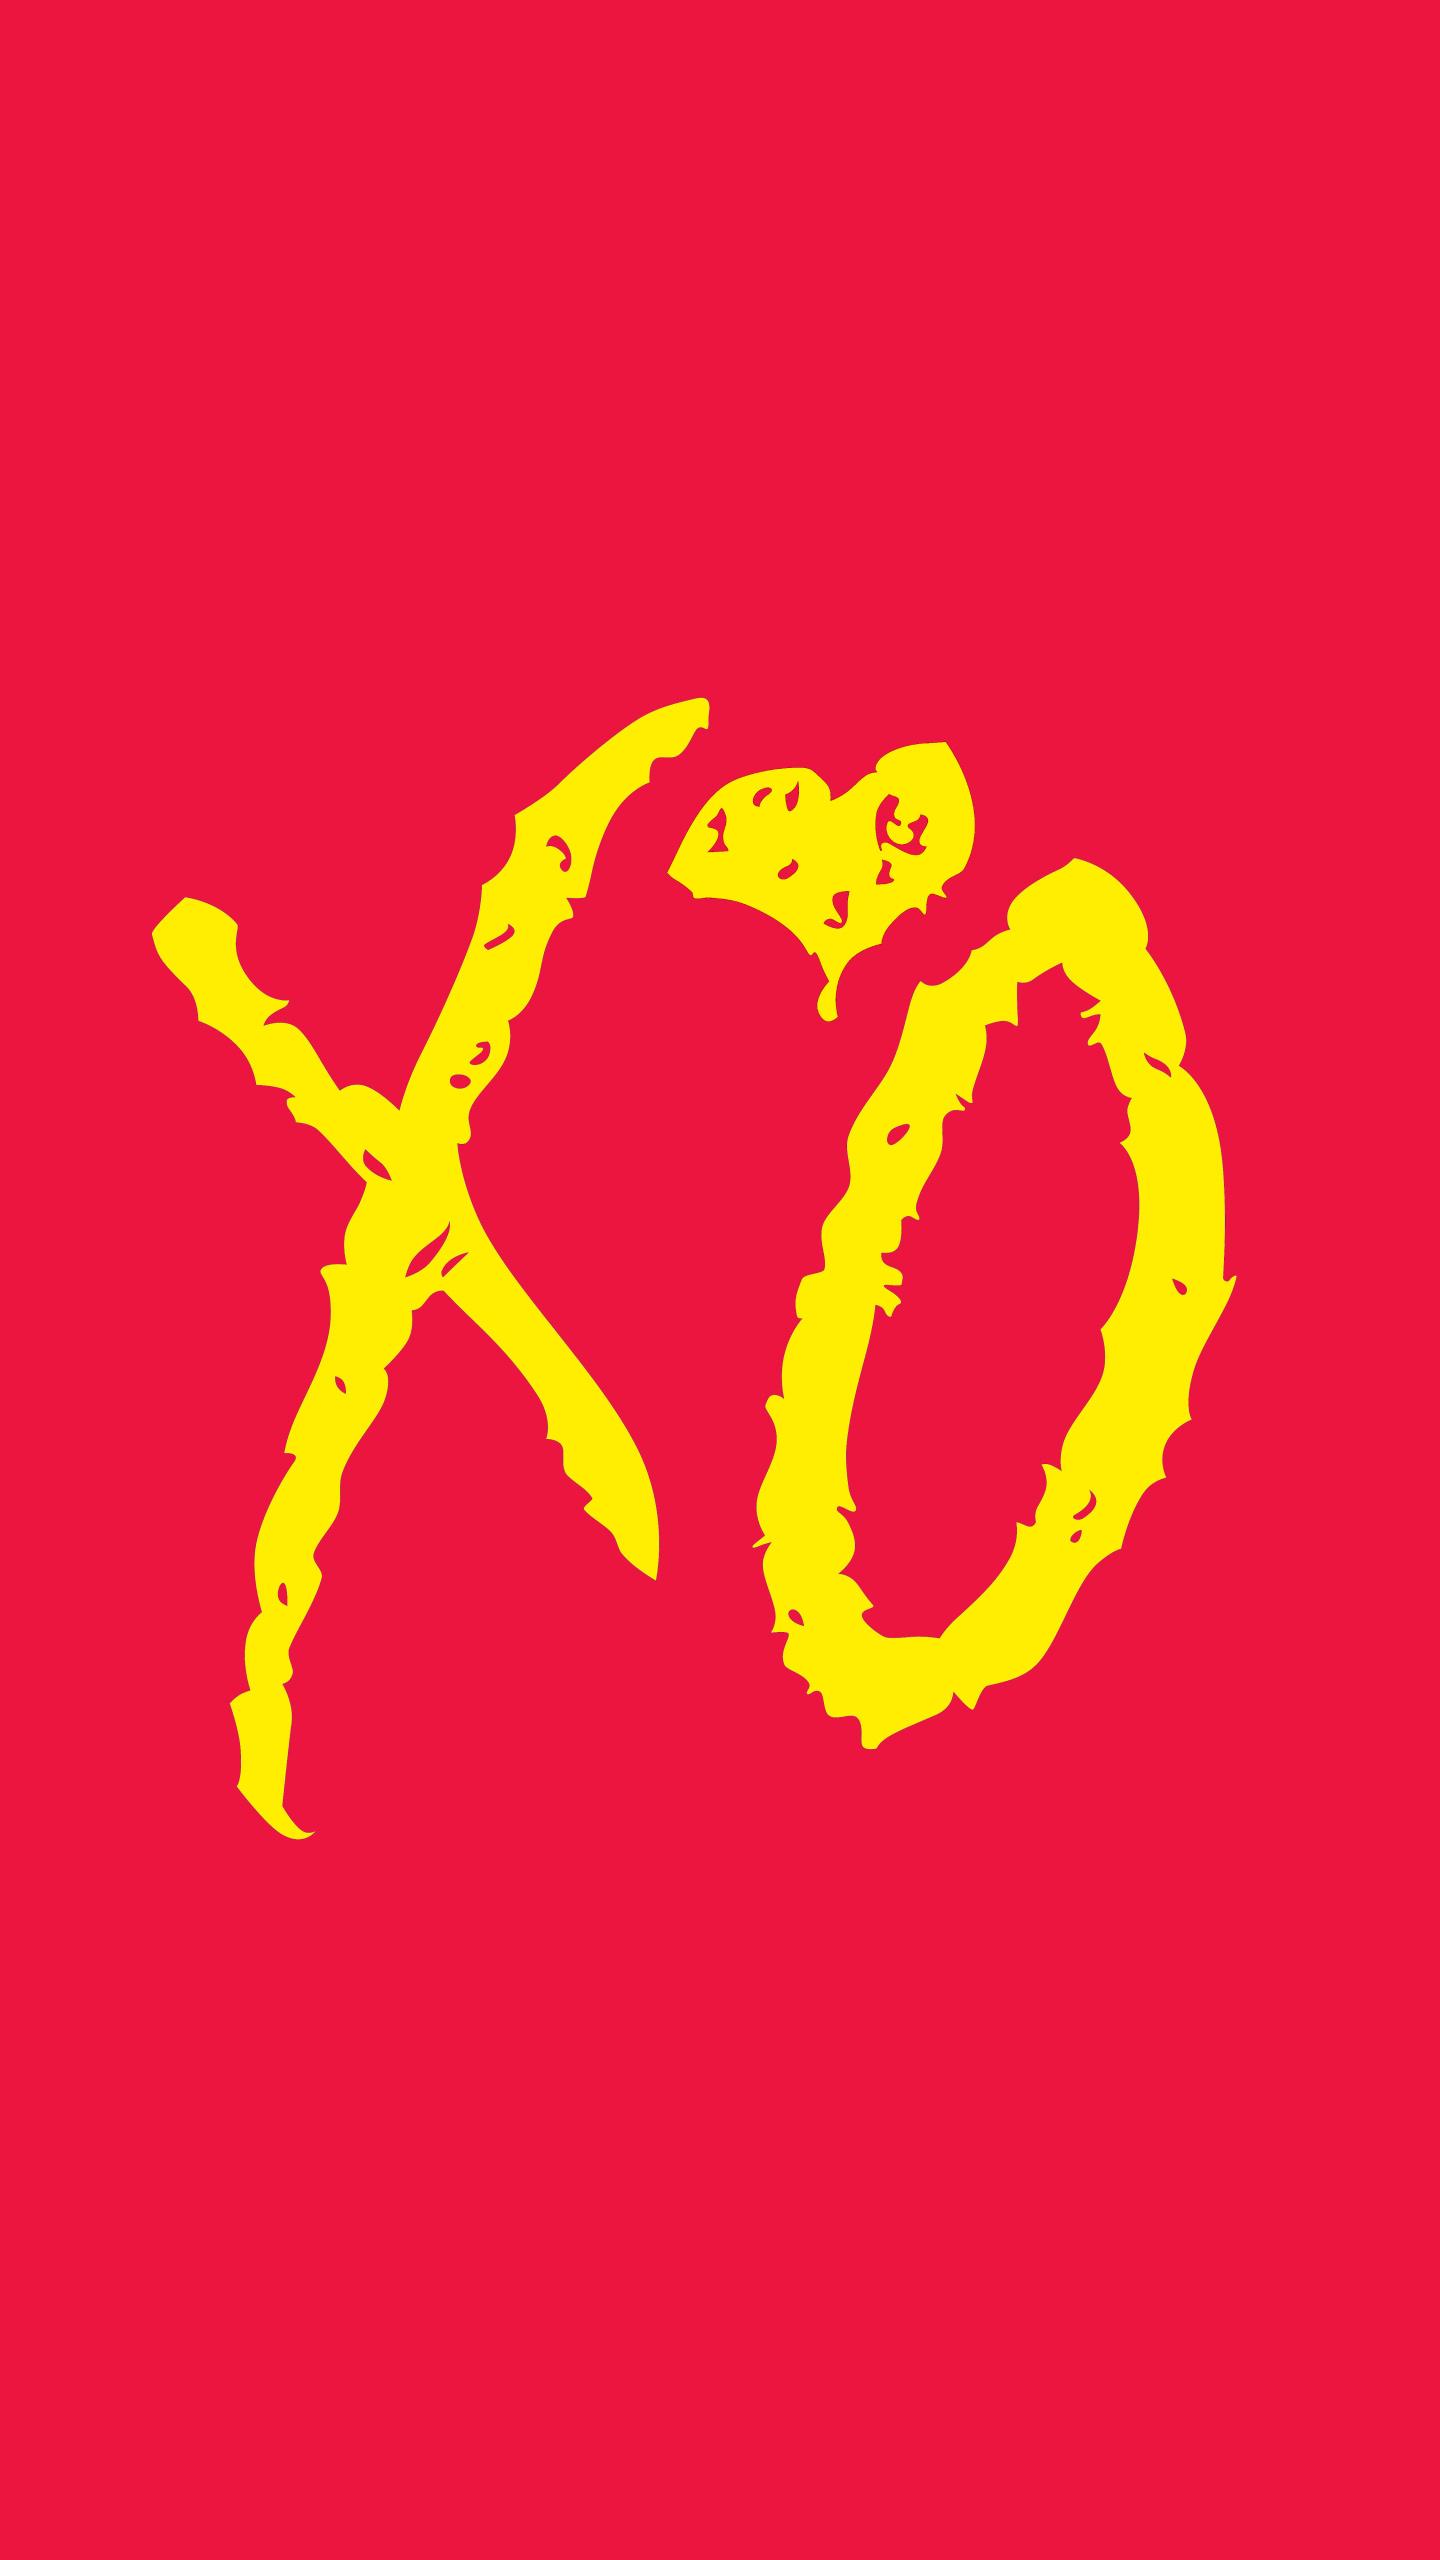 Gold Xo Wallpaper Background